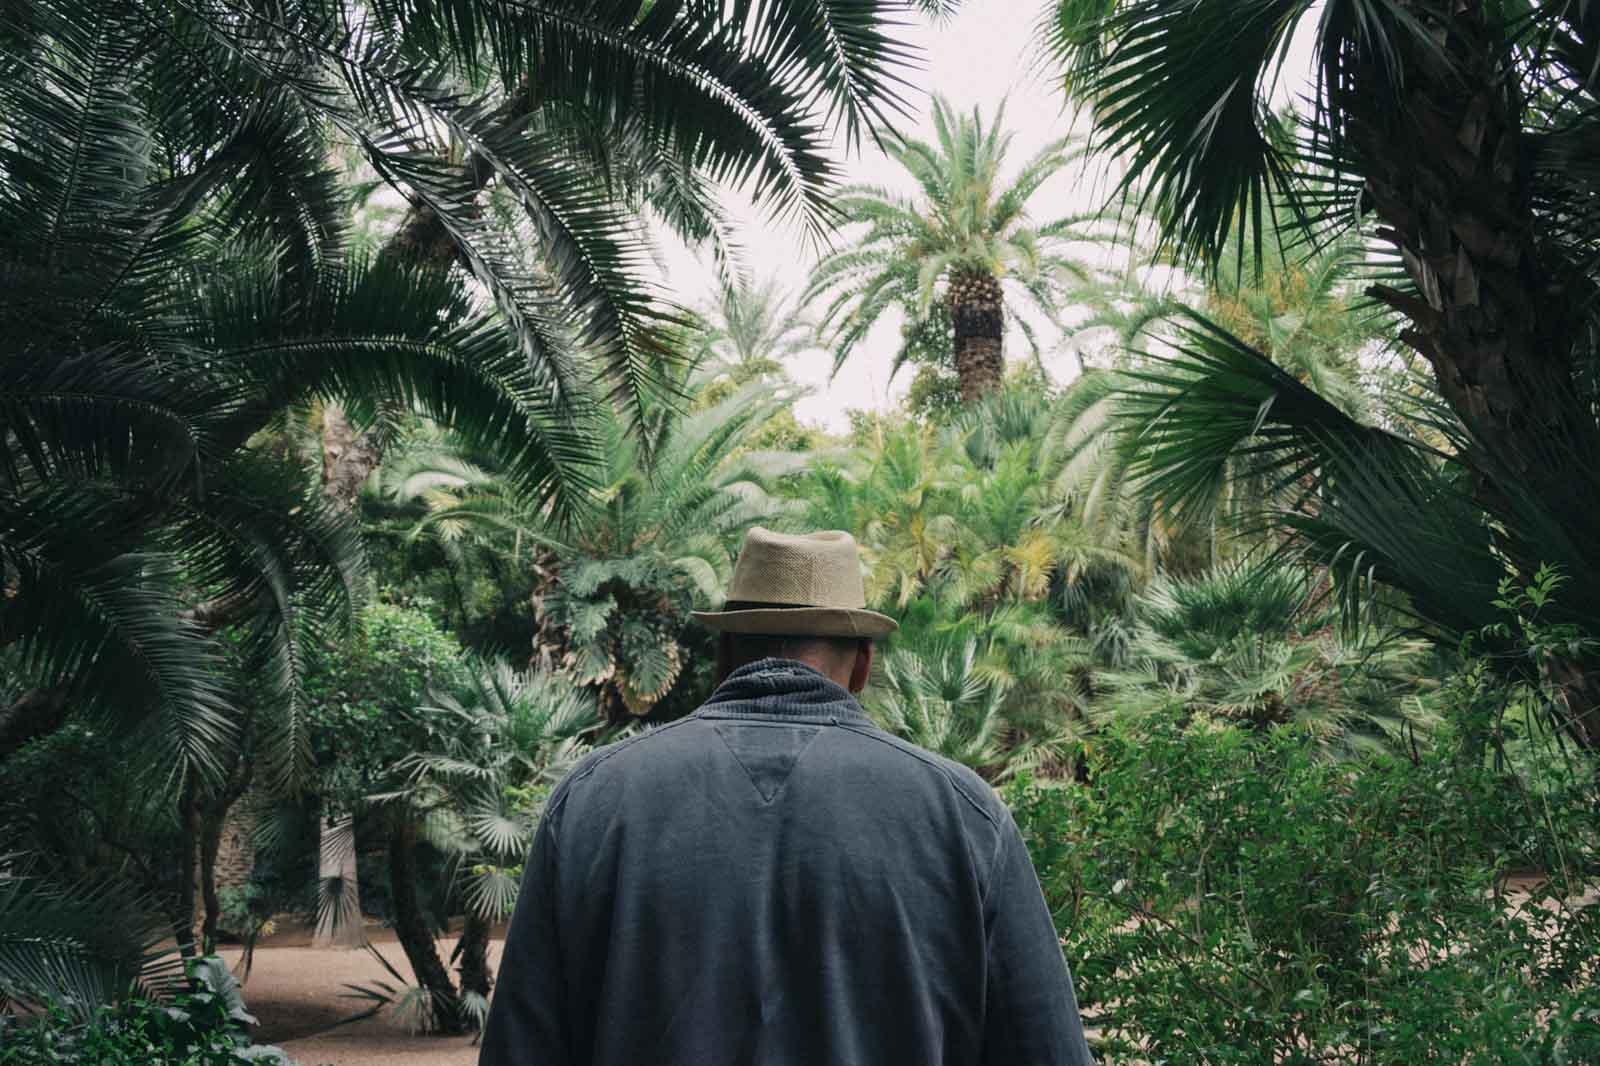 Fotografía documental contemporánea - Marrakech